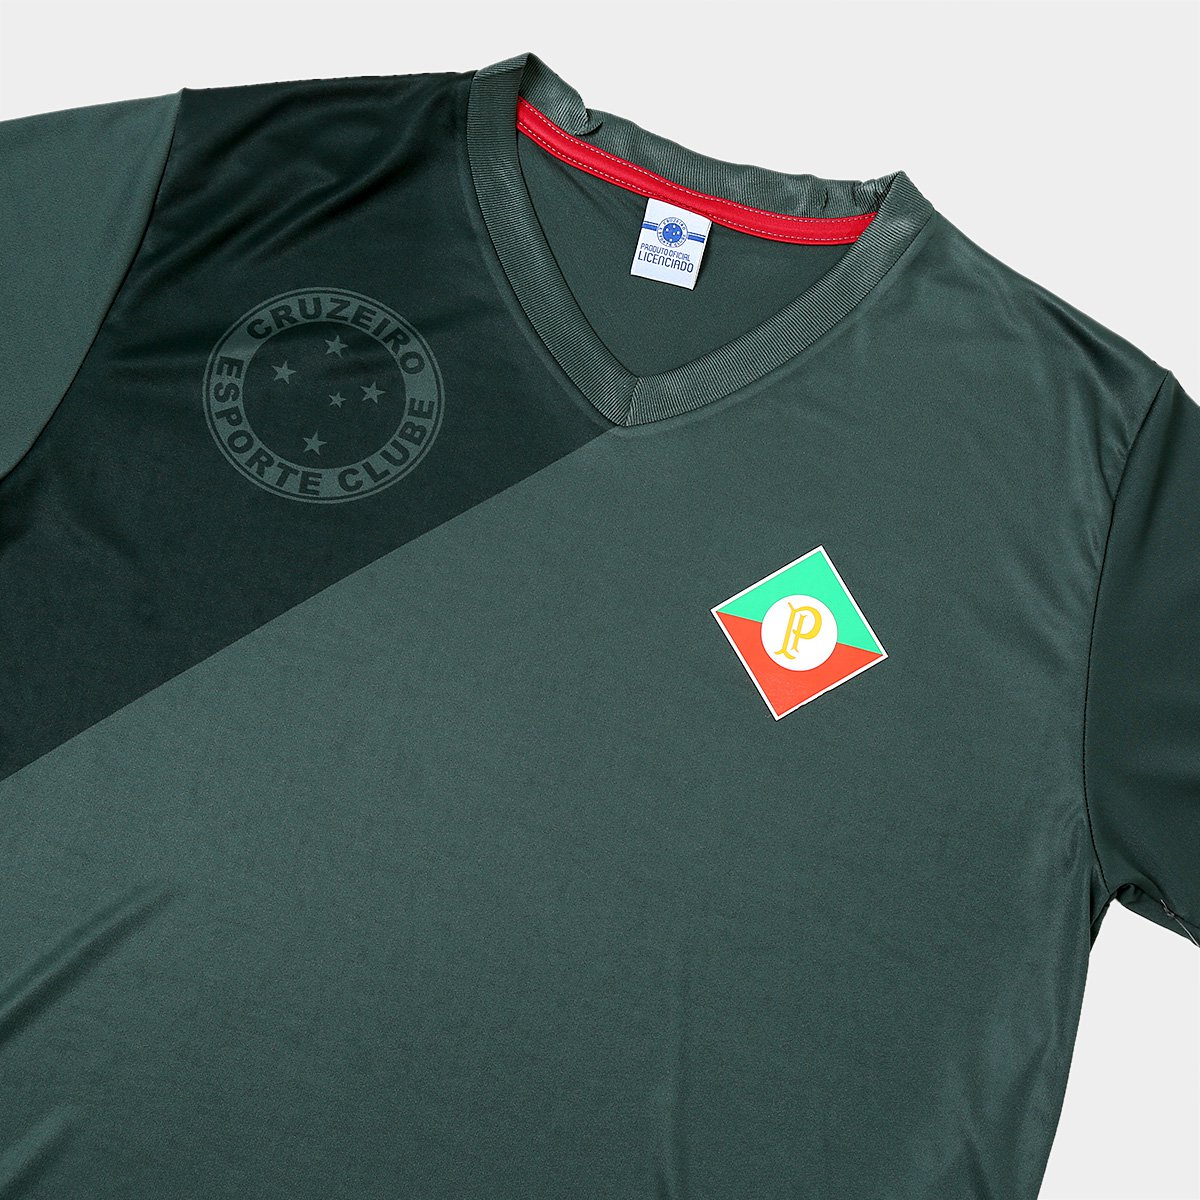 ... Kit Camisa Retrô Cruzeiro Palestra Itália + Camisa Retrô Cruzeiro s nº  Masculina ... 2404dfec93b09